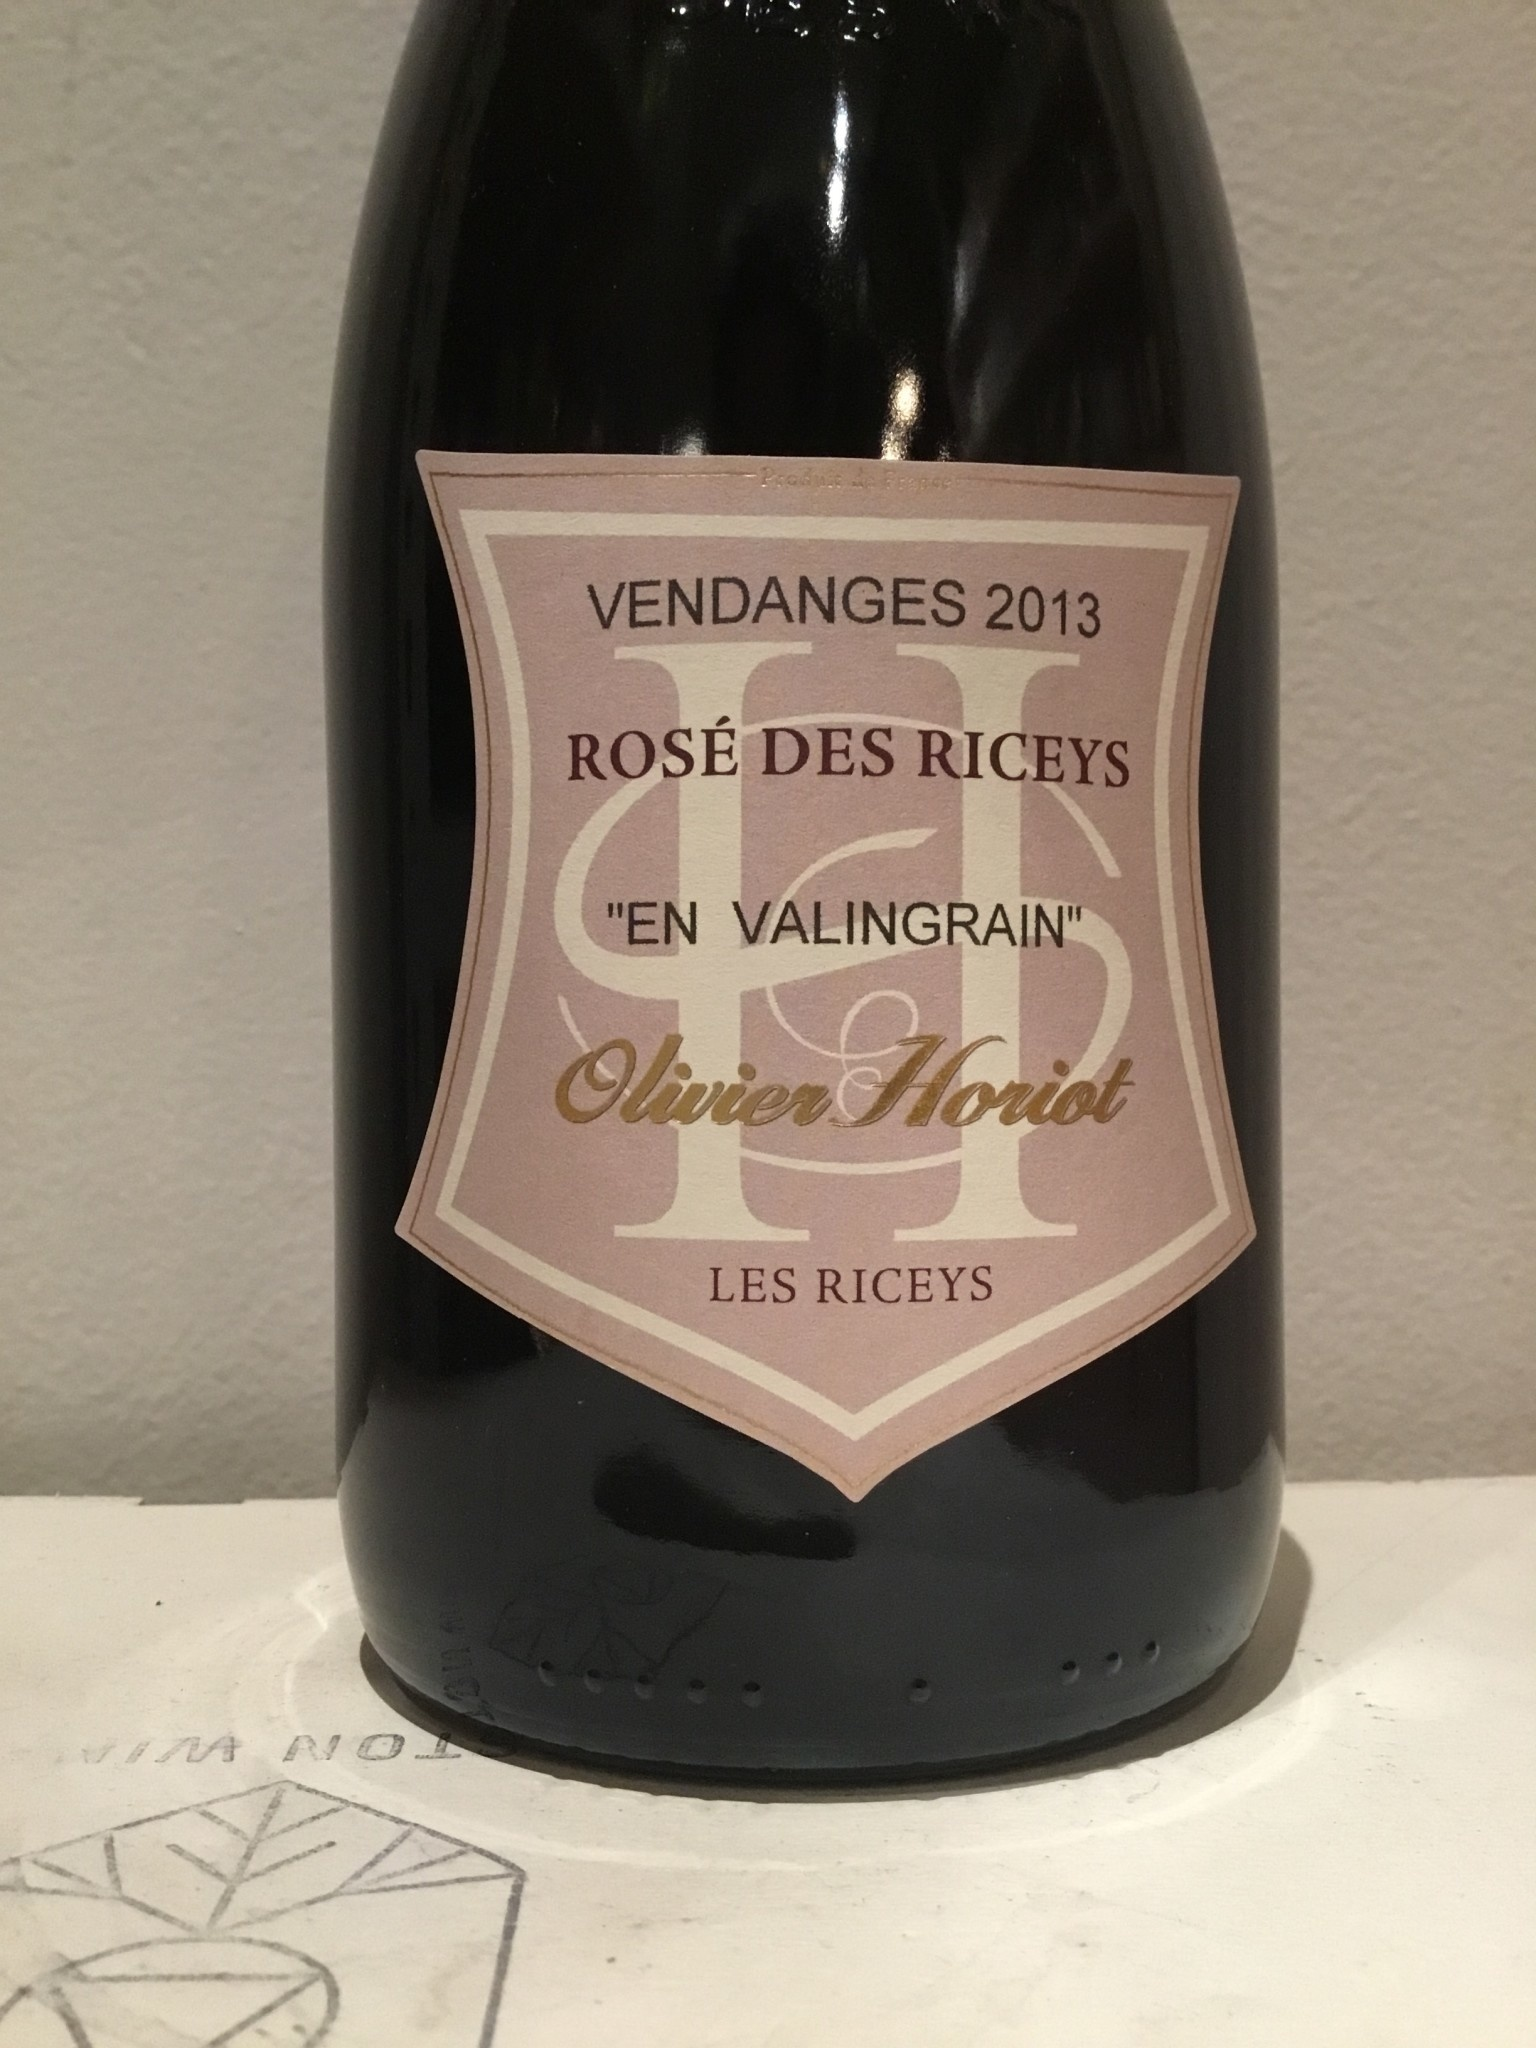 2013 Olivier Horiot Rose des Riceys en Valingrain, 750ml